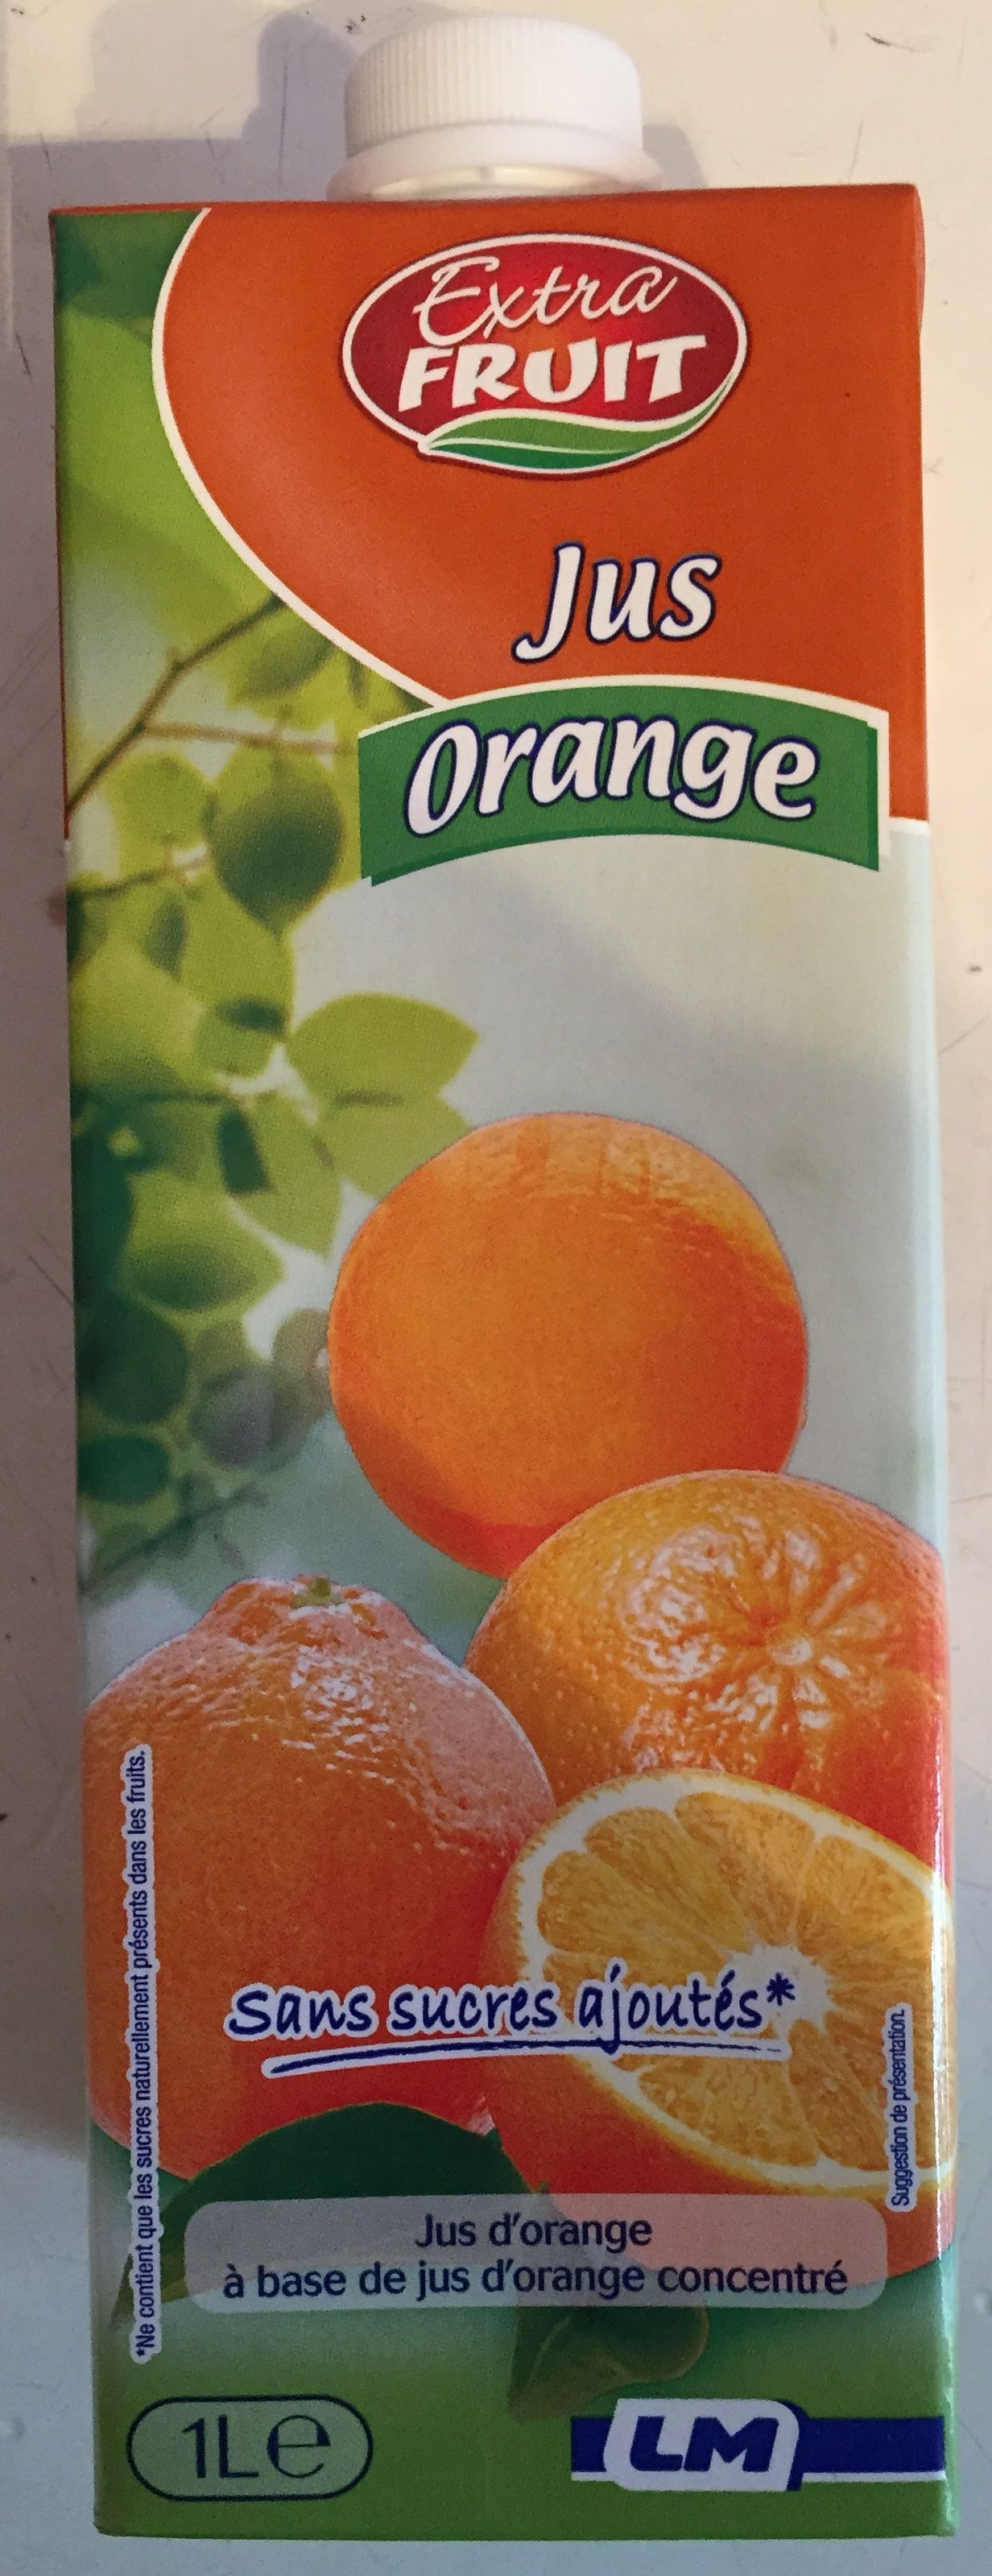 Jus Orange - Product - fr